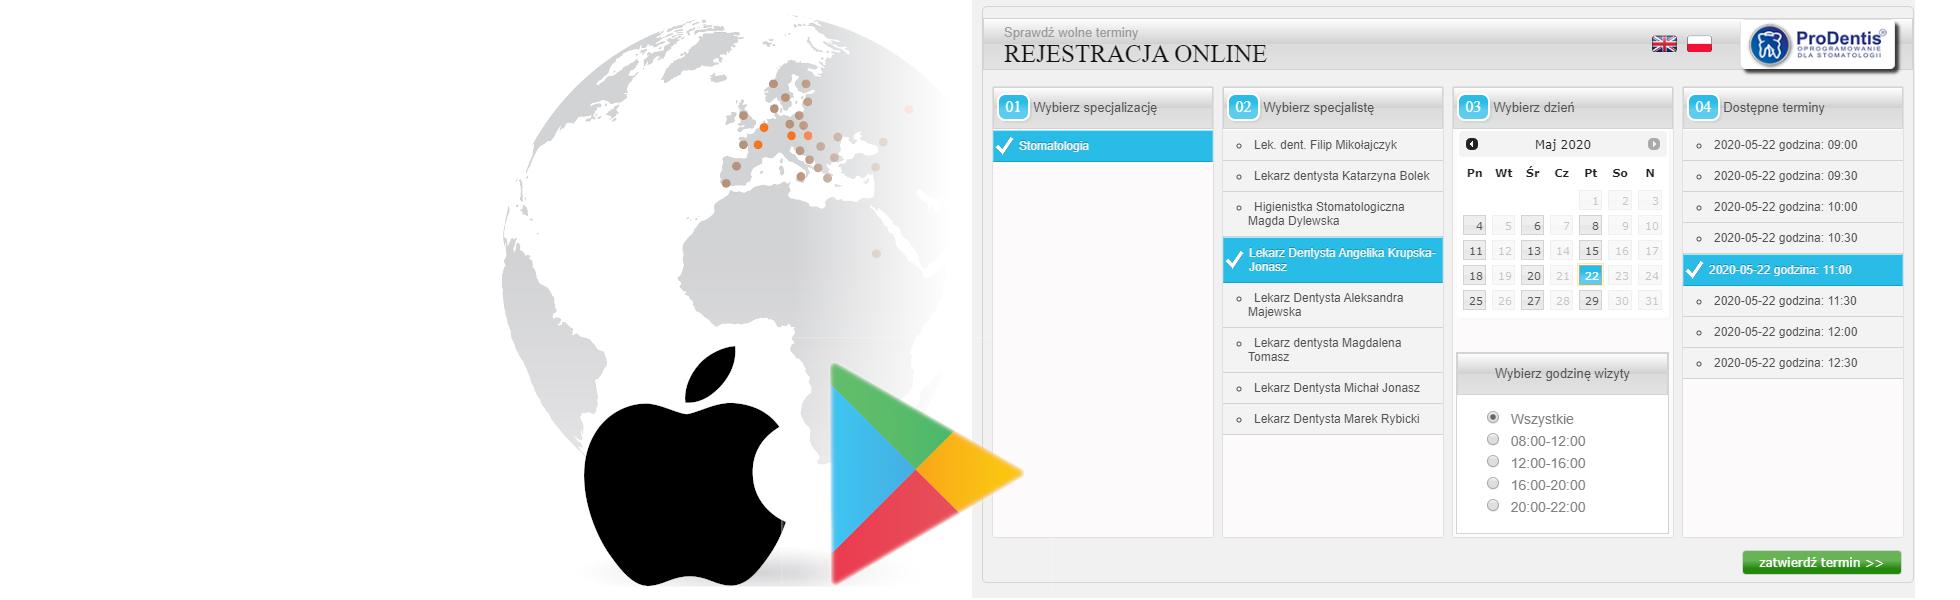 Rejestracja online lub Apka / Online Registration or App